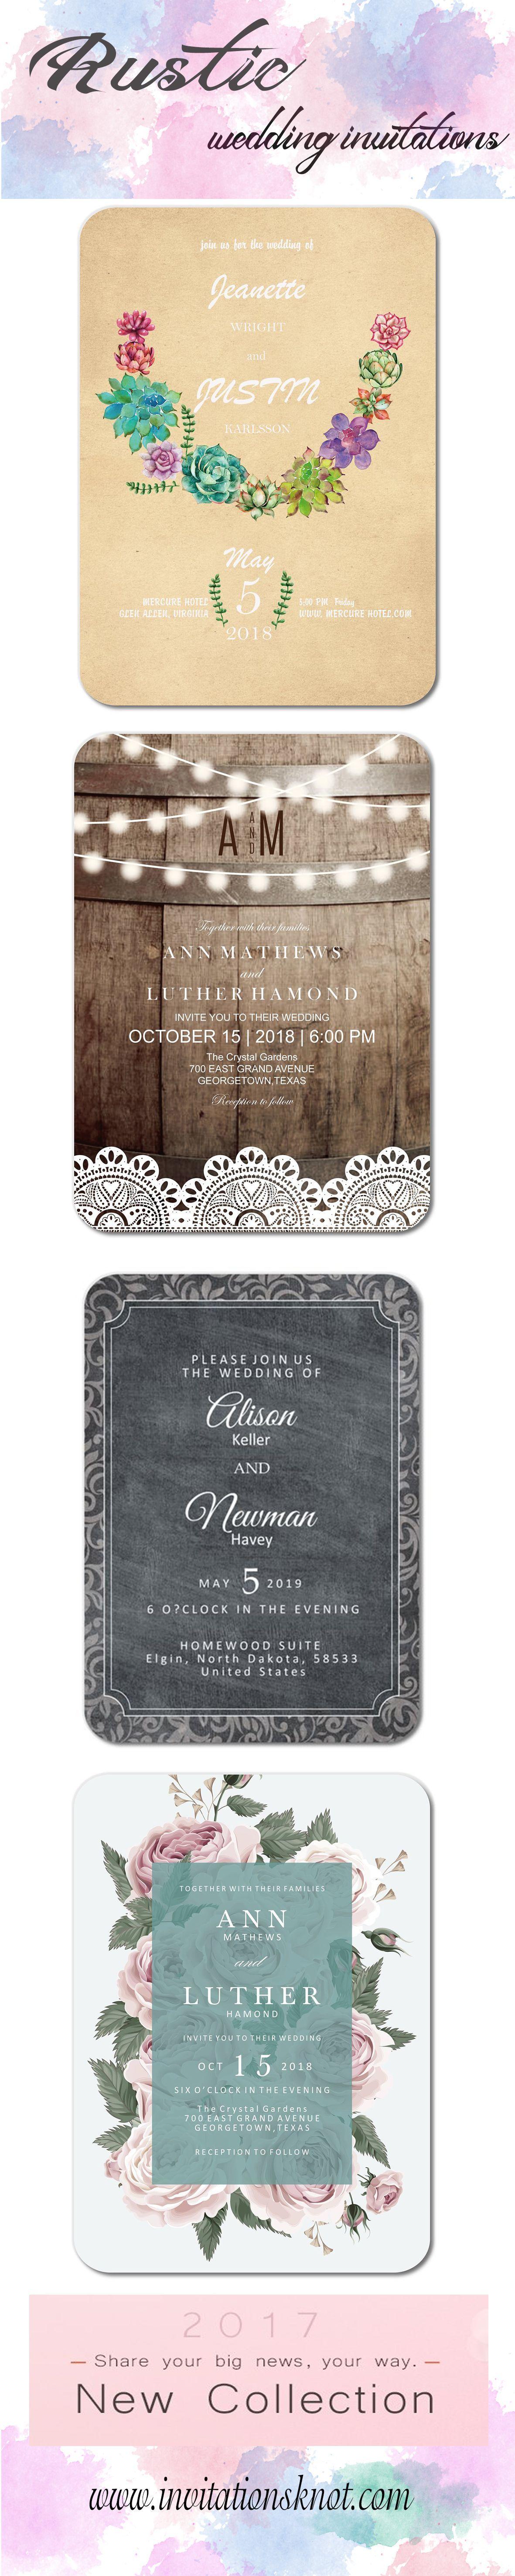 Rustic wedding invitations wedding ideas unique wedding